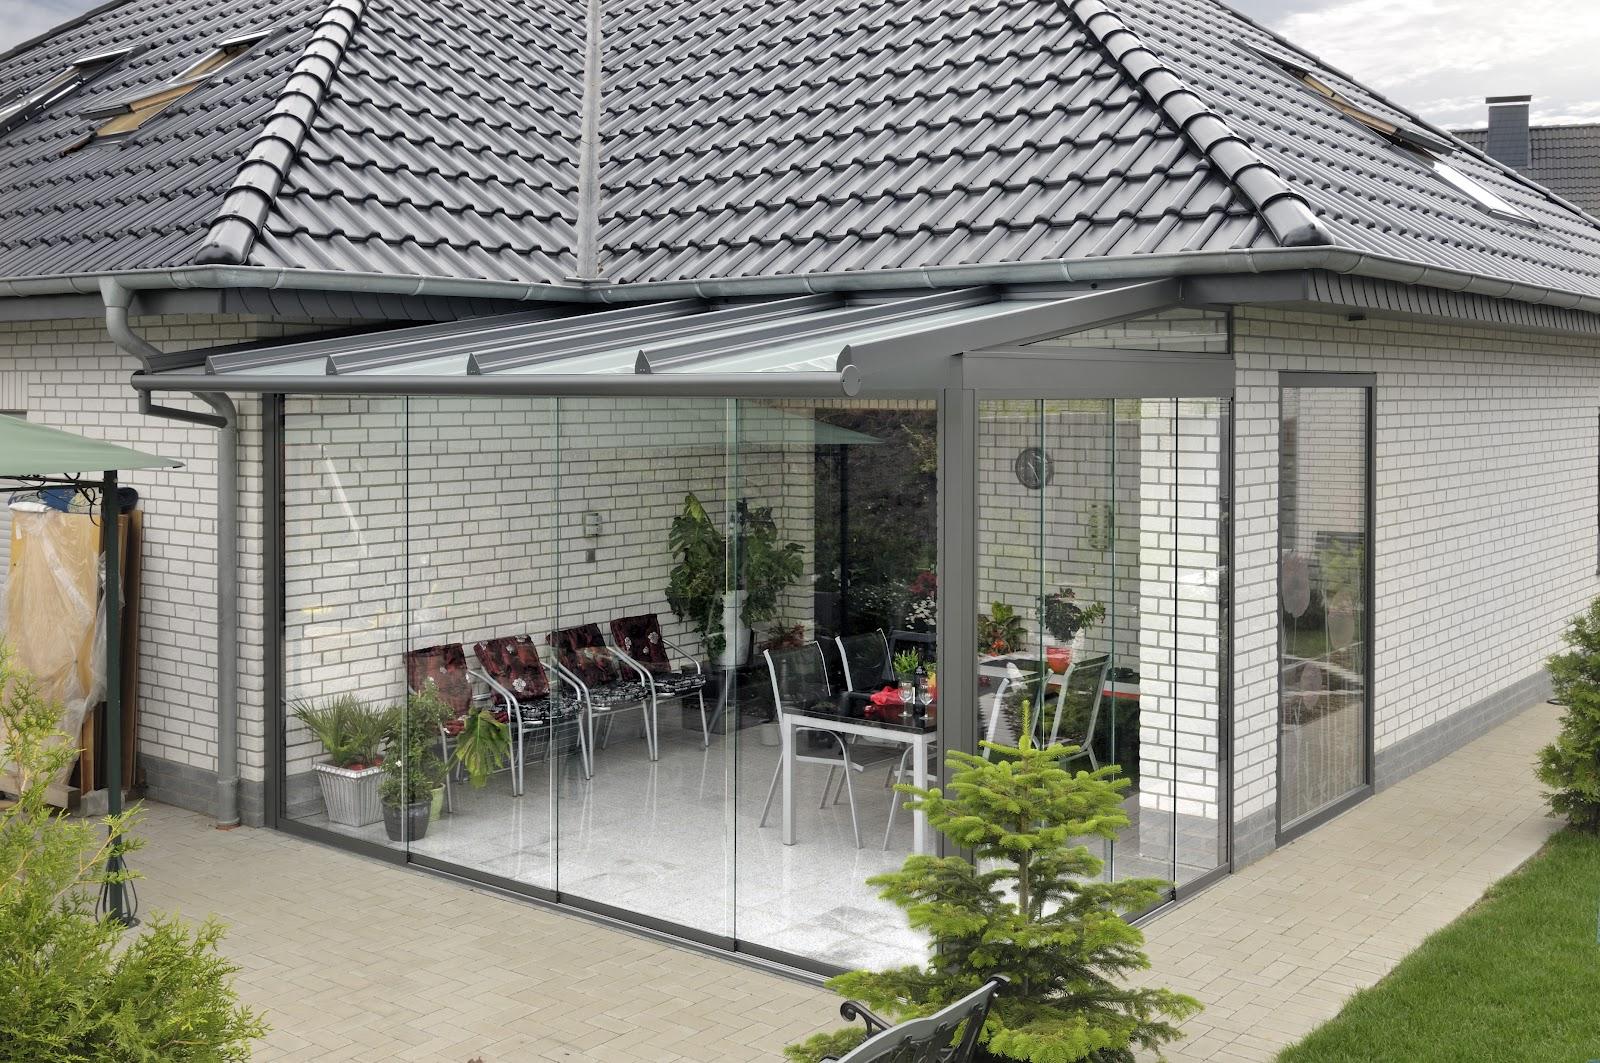 Скляна тераса біля входу в будинок